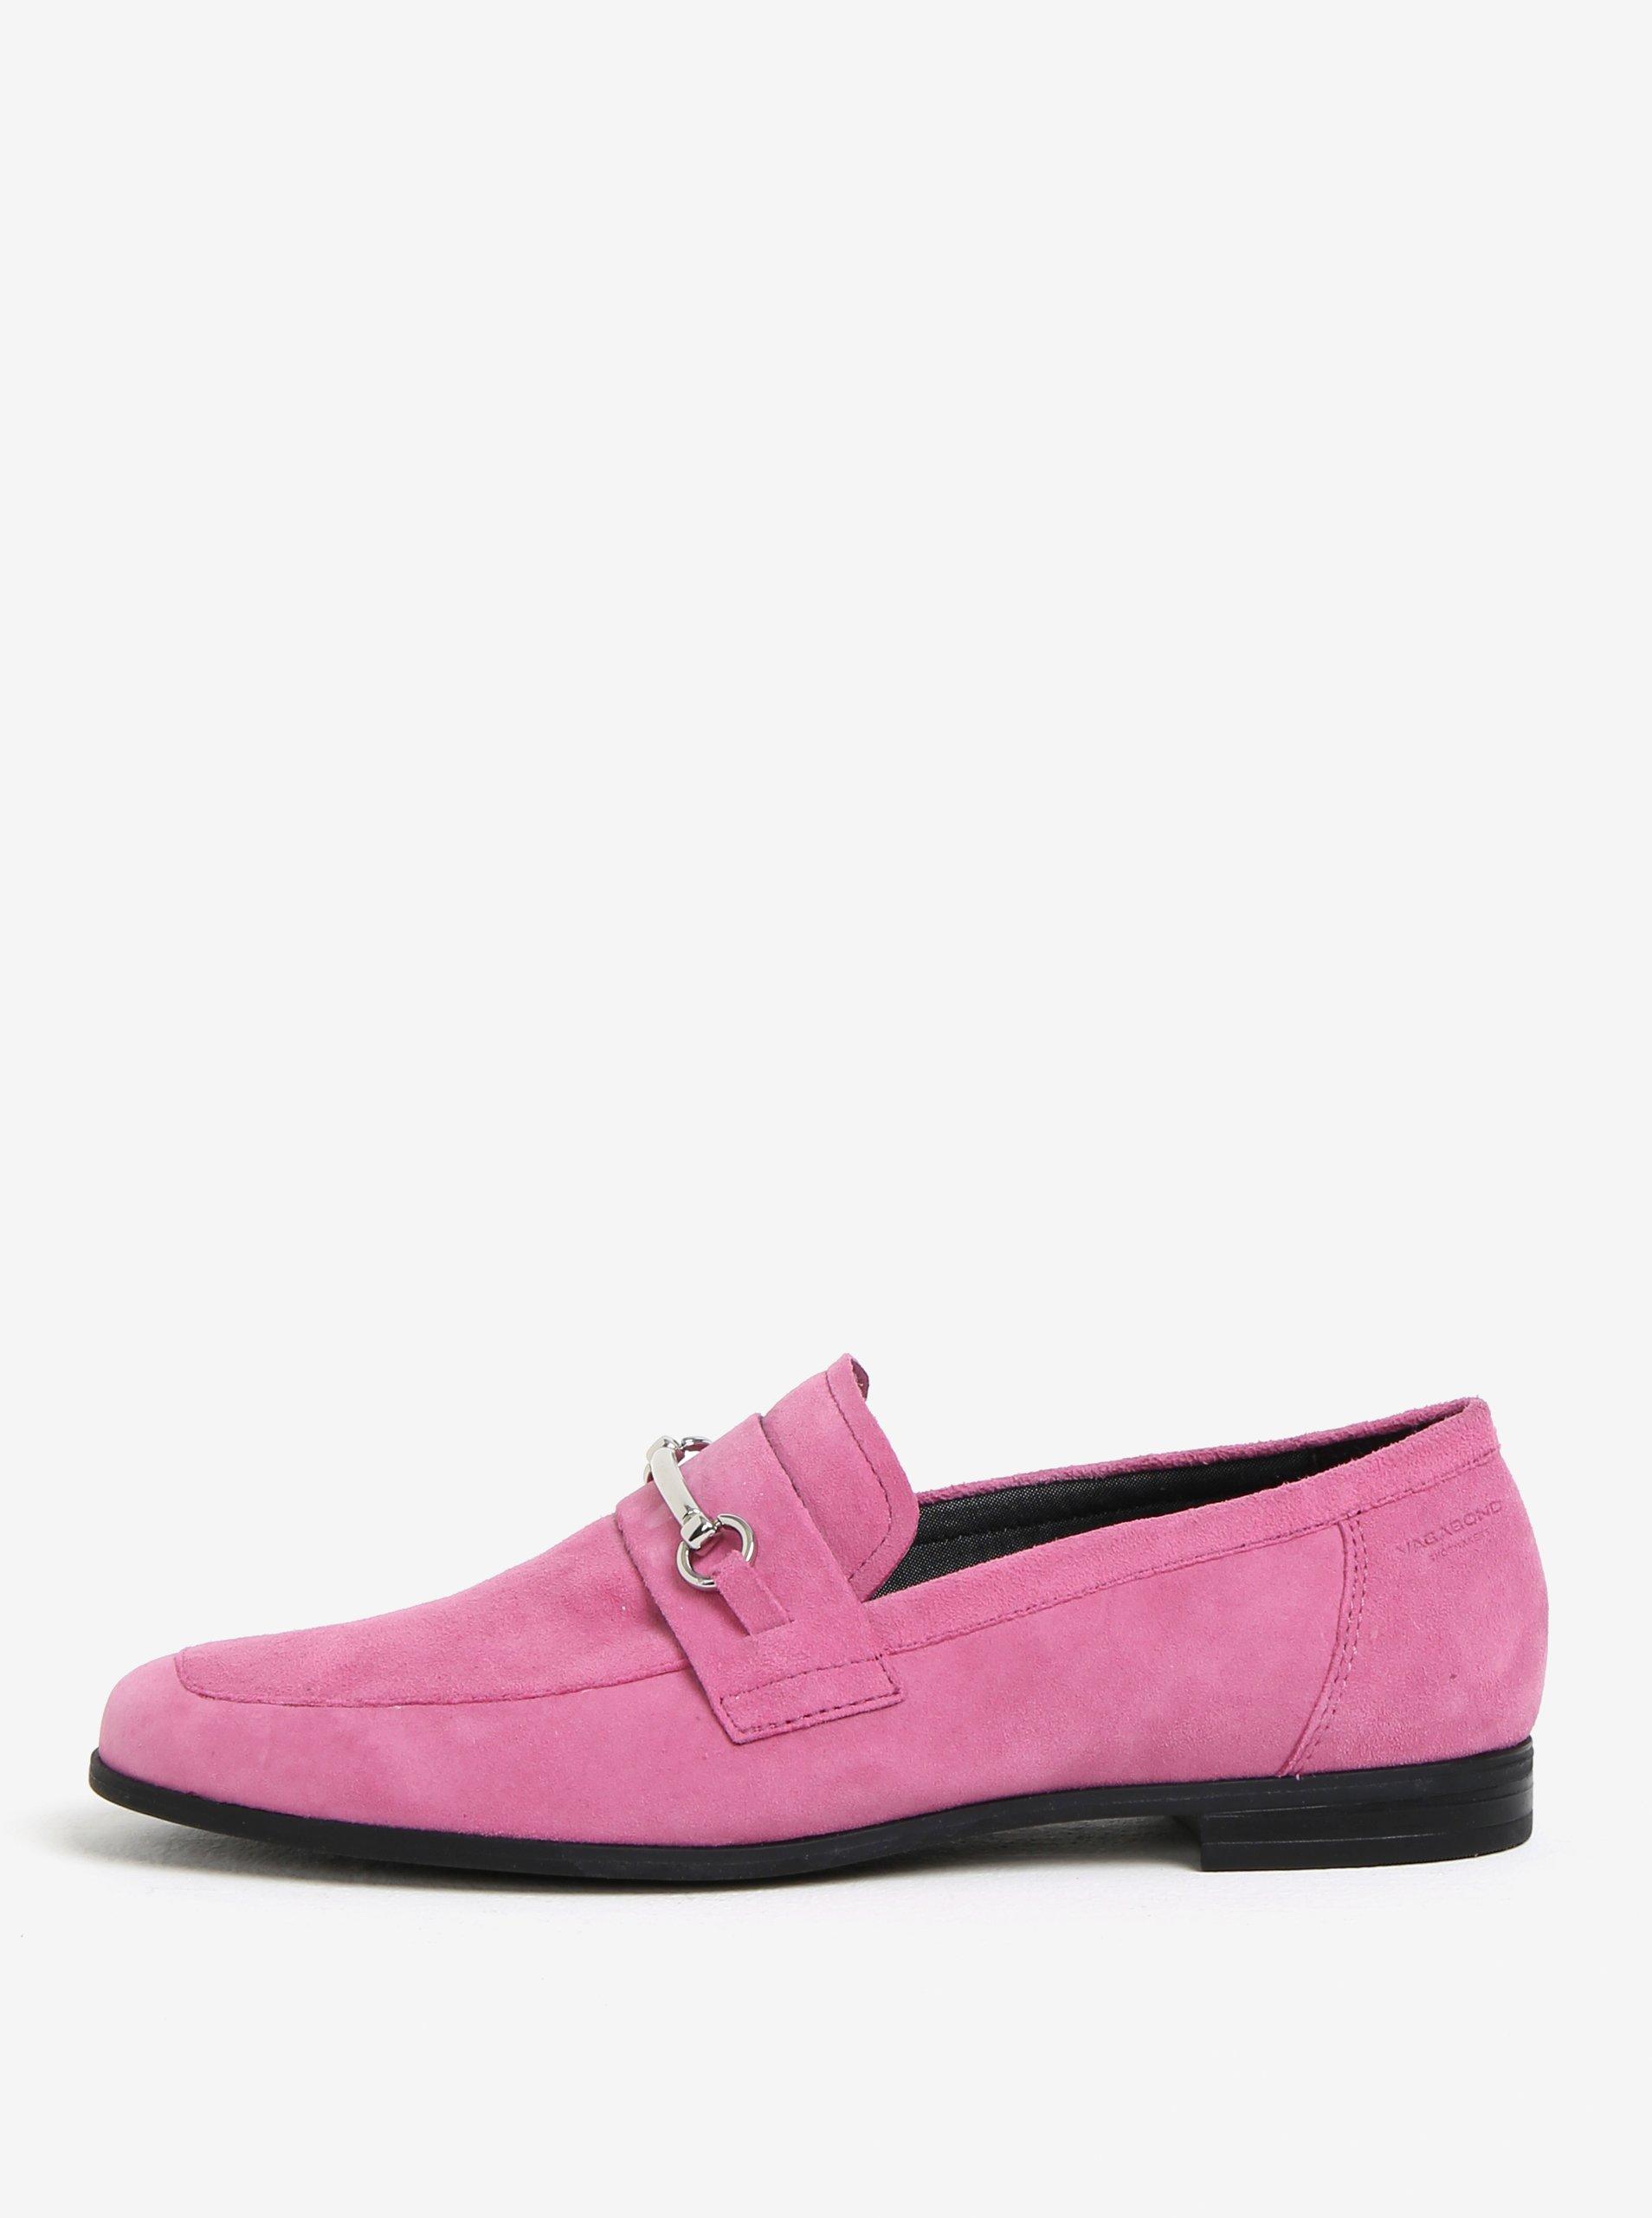 Ružové dámske semišové mokasíny Vagabond Marilyn  cafa17c85cc